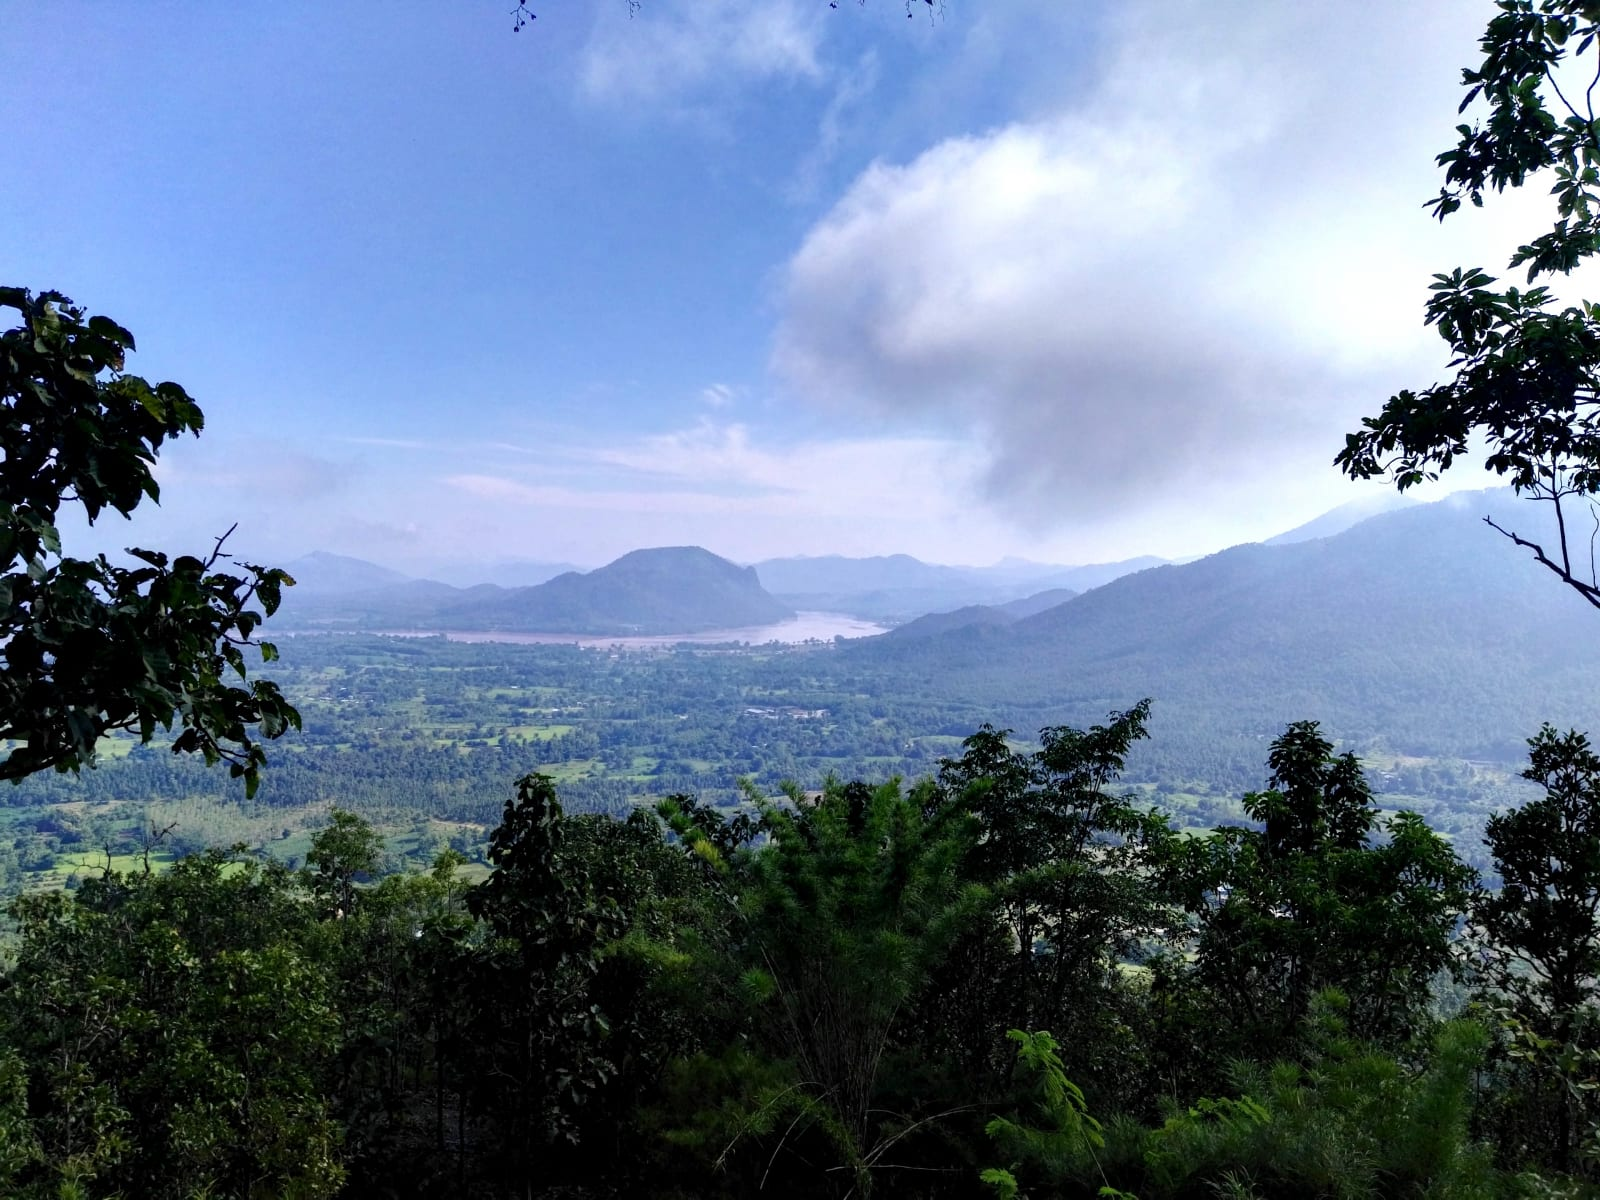 Výhled na Mekong z Phu Tok, Loei, Thajsko